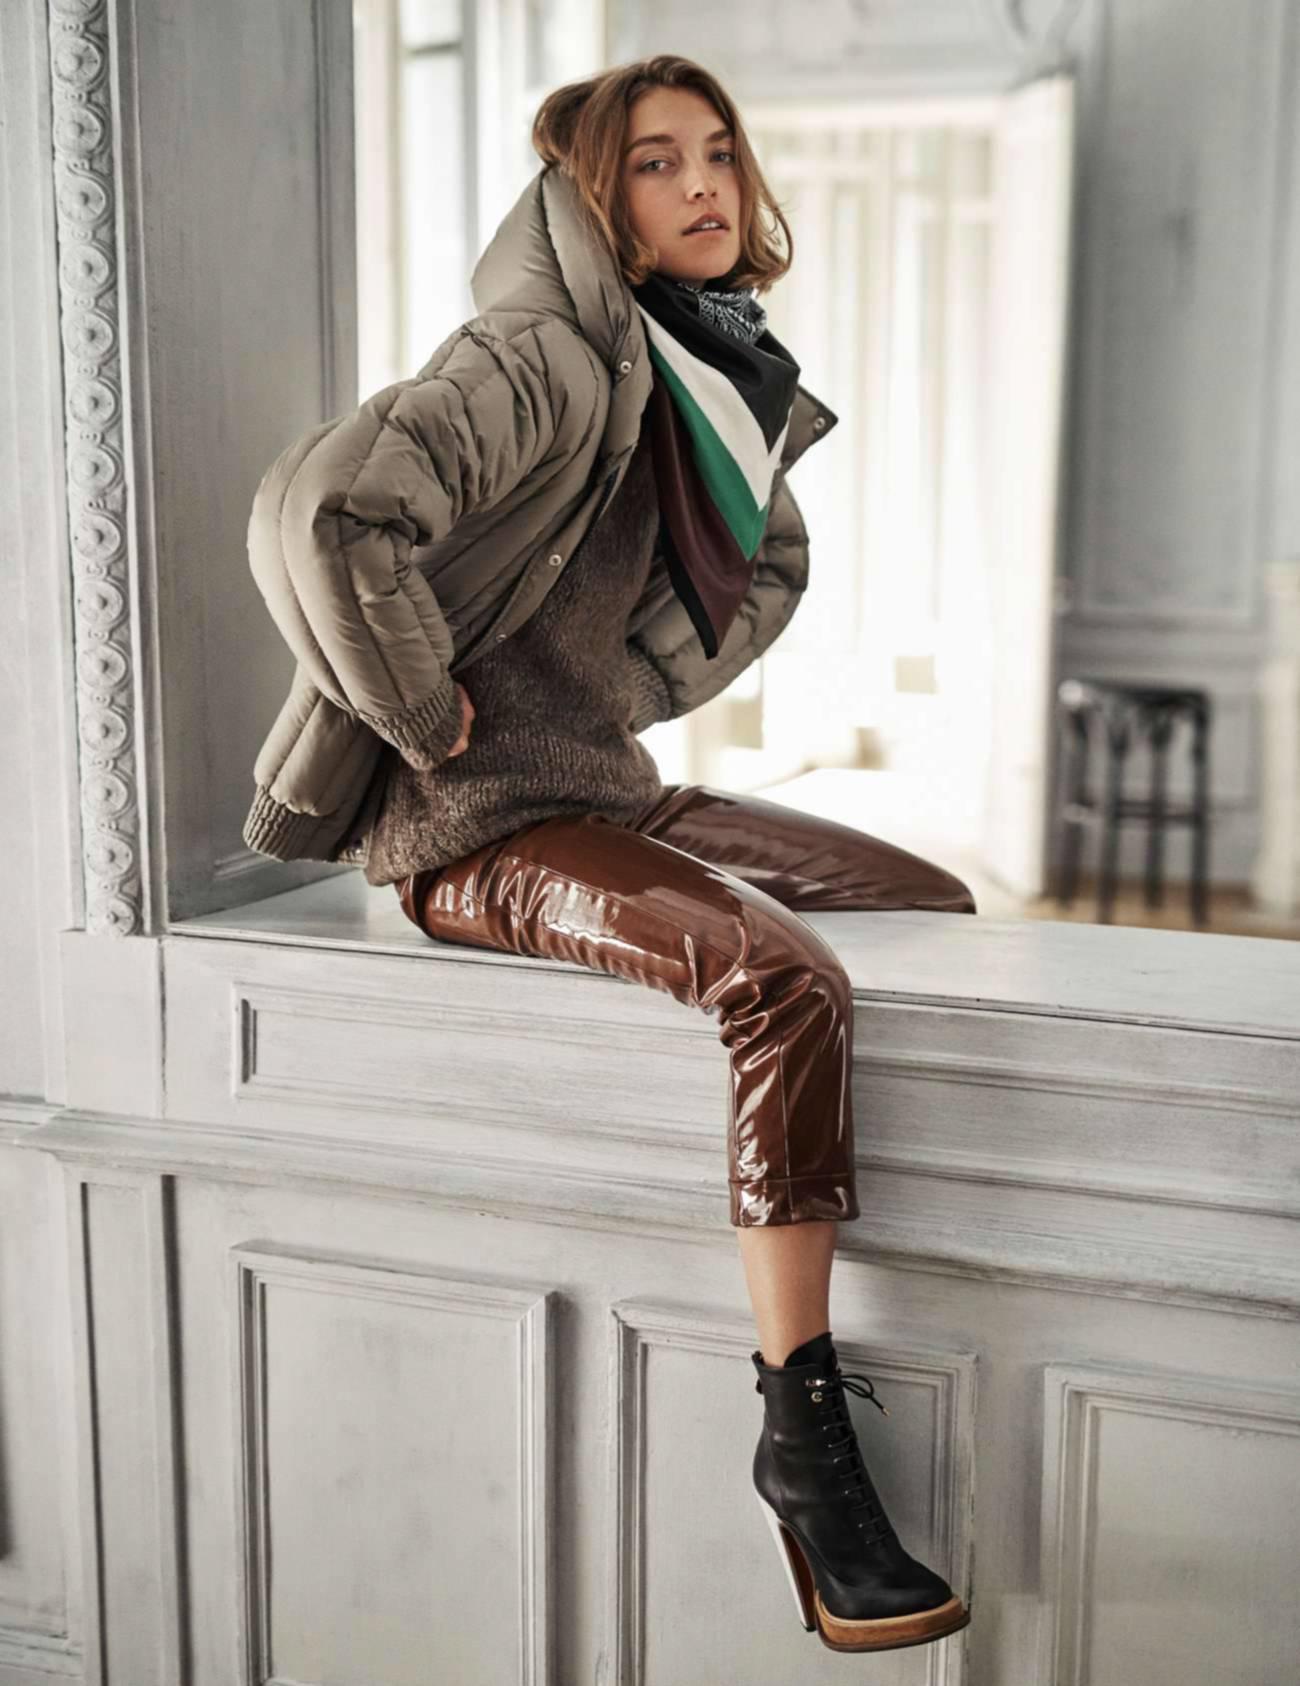 пуховик оверсайз из нейлона, джемпер, виниловые брюки, ботинки на шнуровке, Carven; бандана с принтом, Wanda Nylon